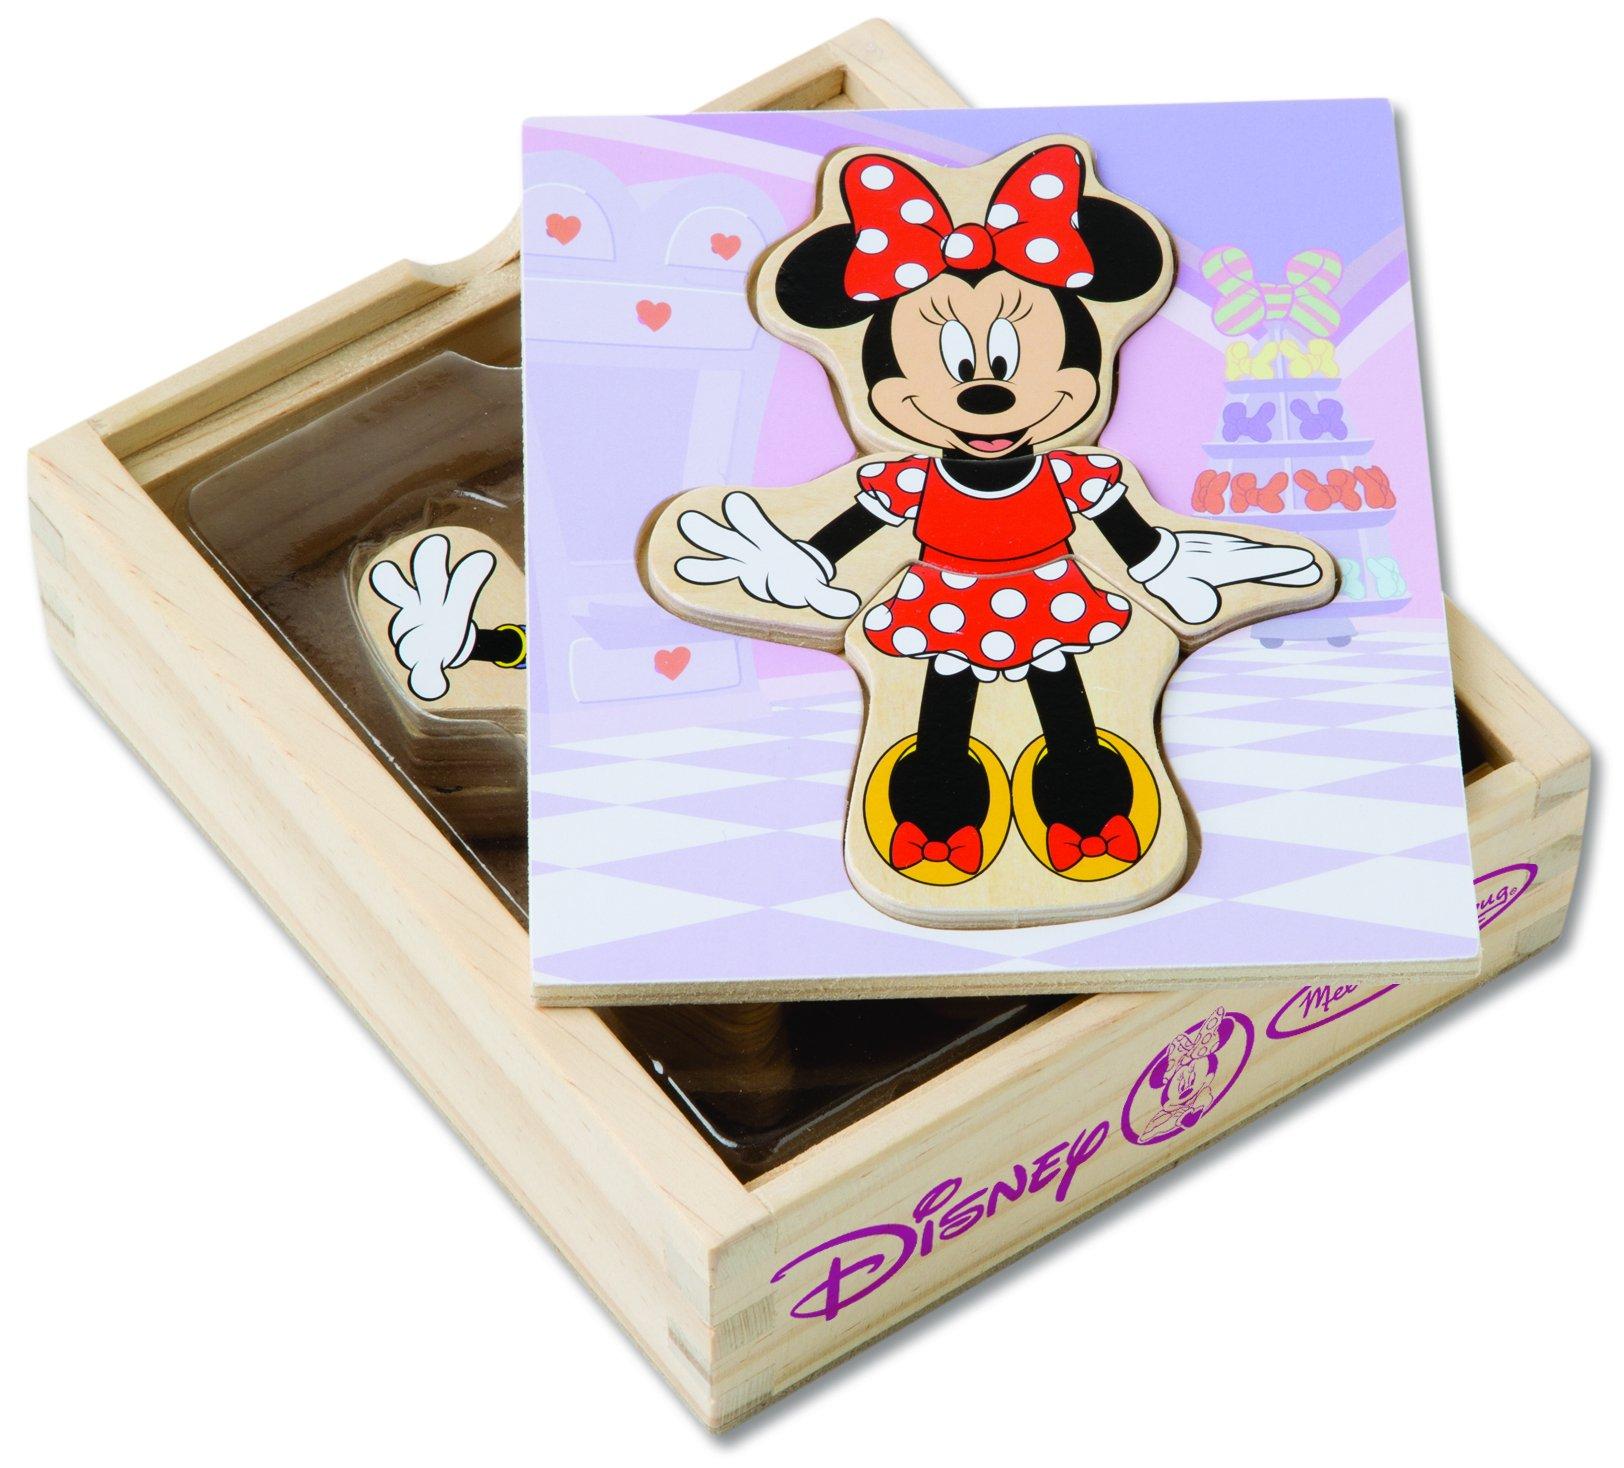 Melissa & Doug Disney Minnie Mouse Mix and Match Dress-Up Wooden Play Set (18 pcs)